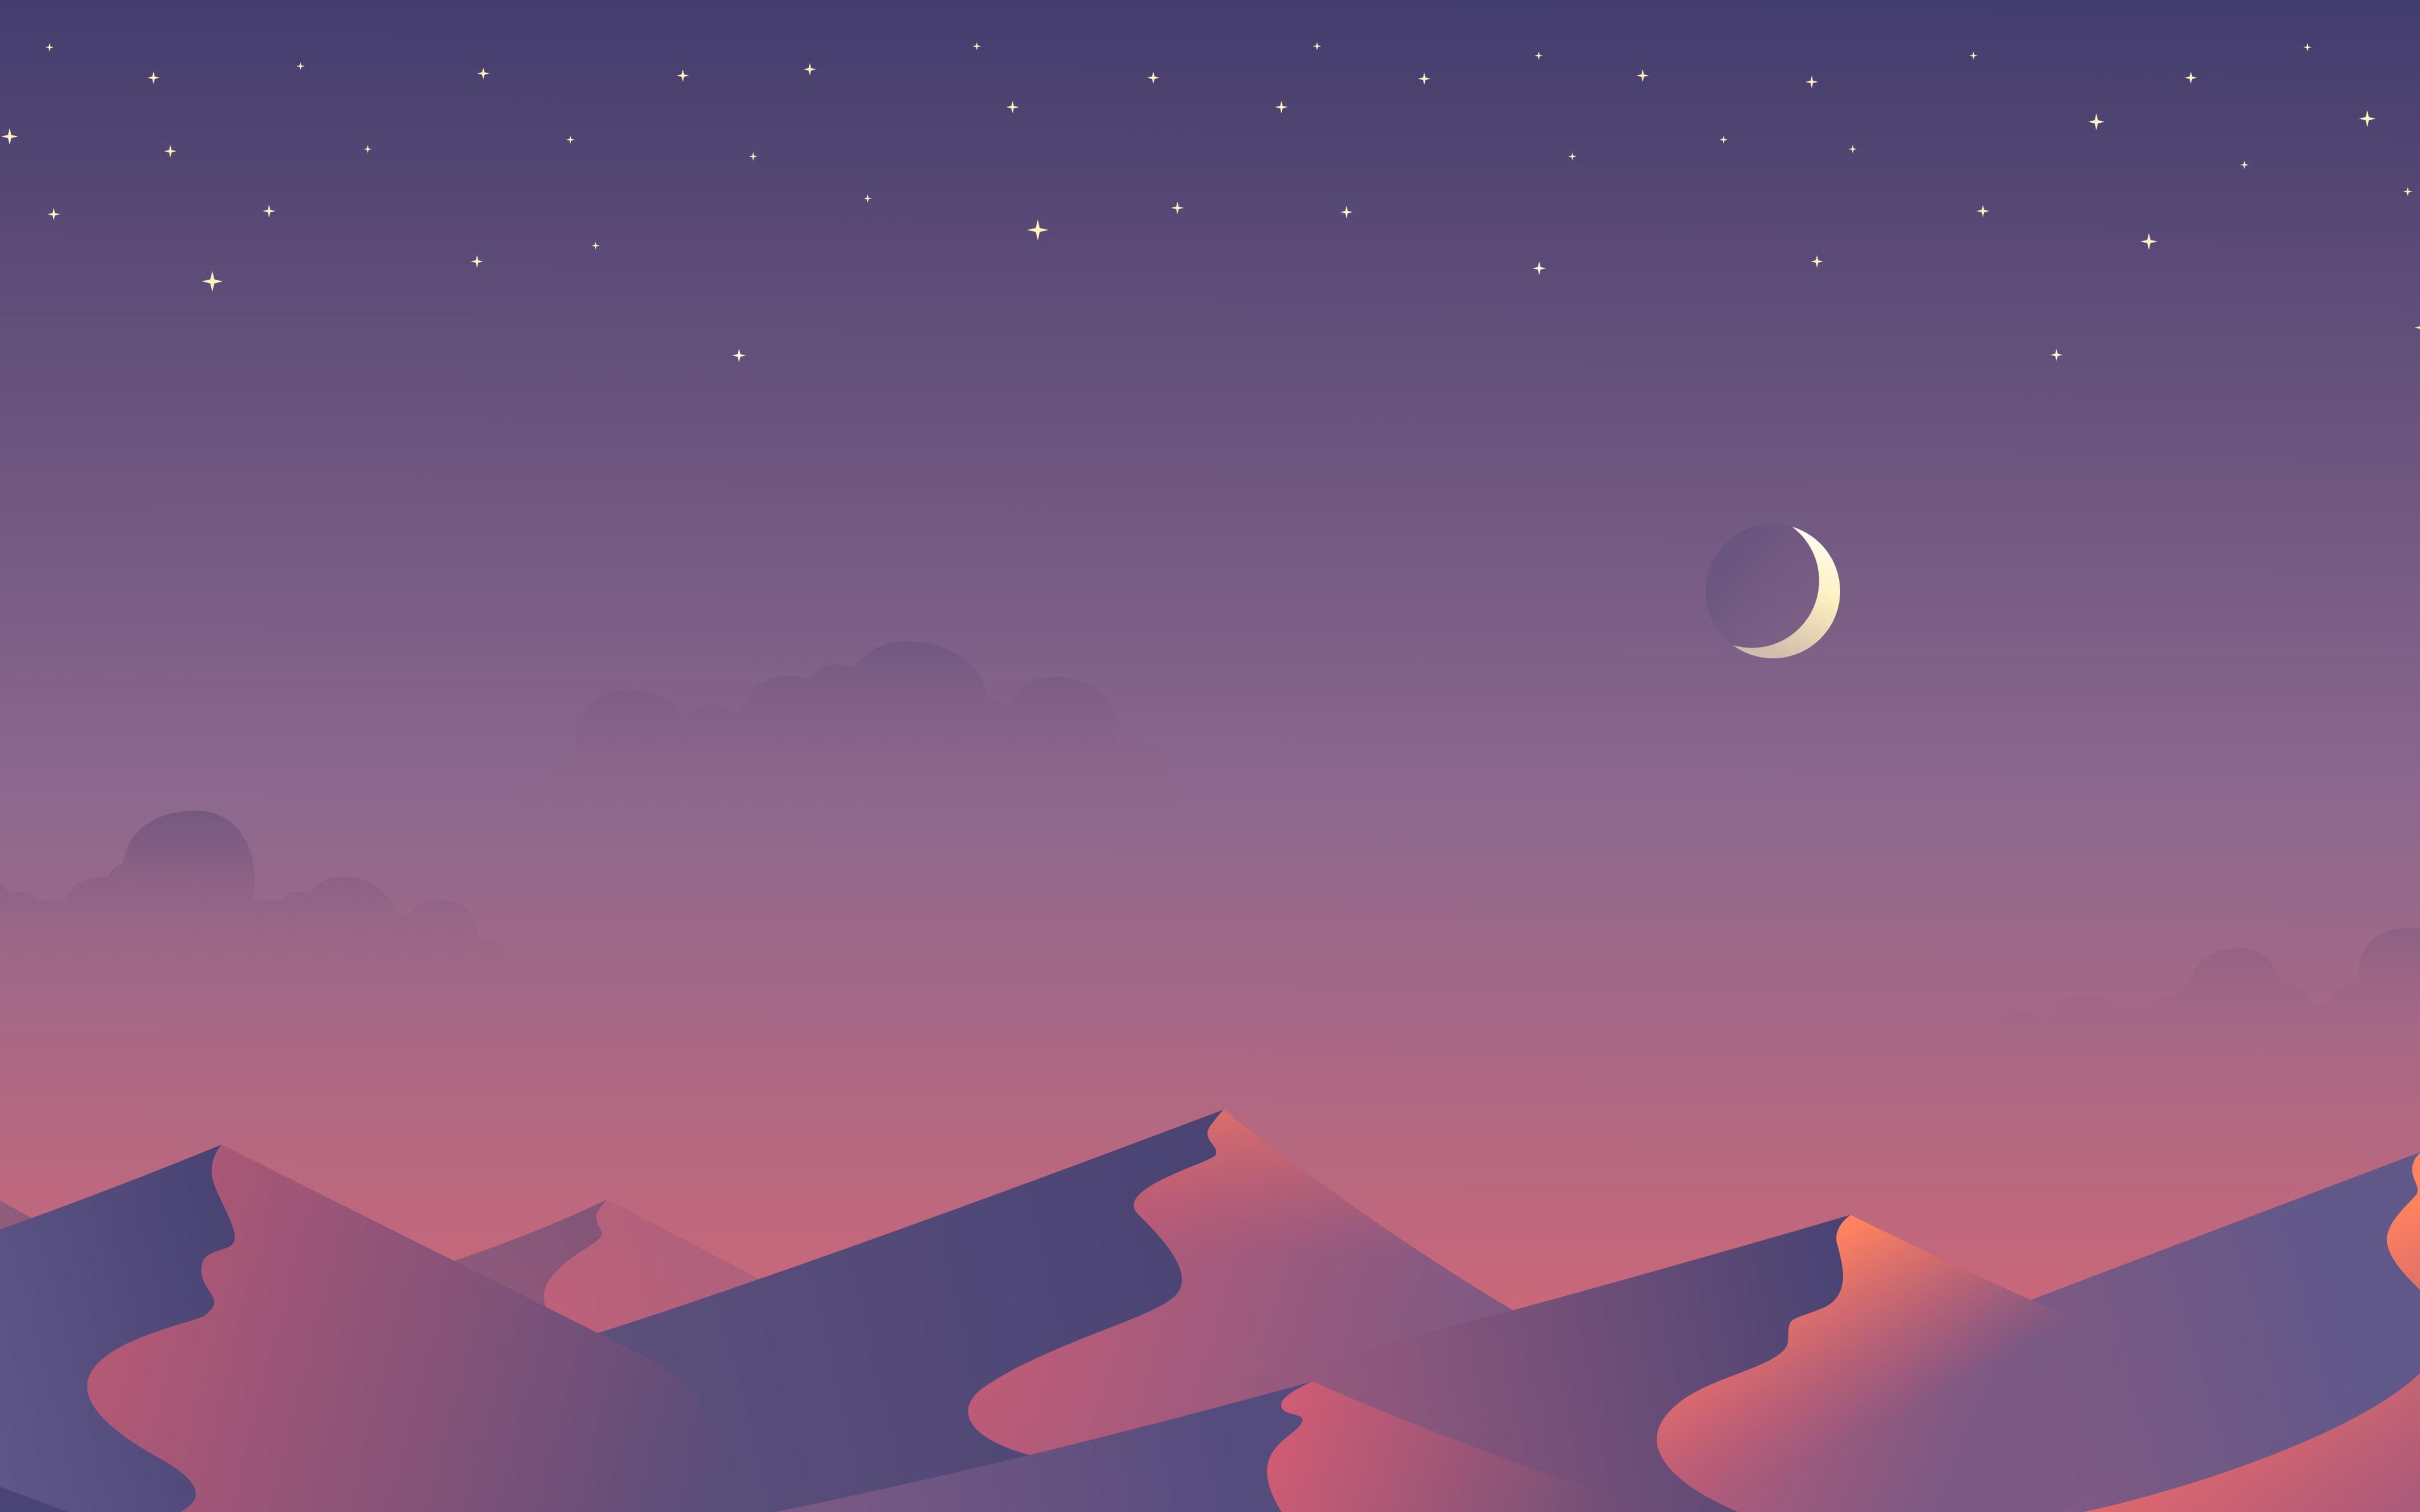 Desert Nights Moon 5k Minimalism, HD 4K Wallpaper